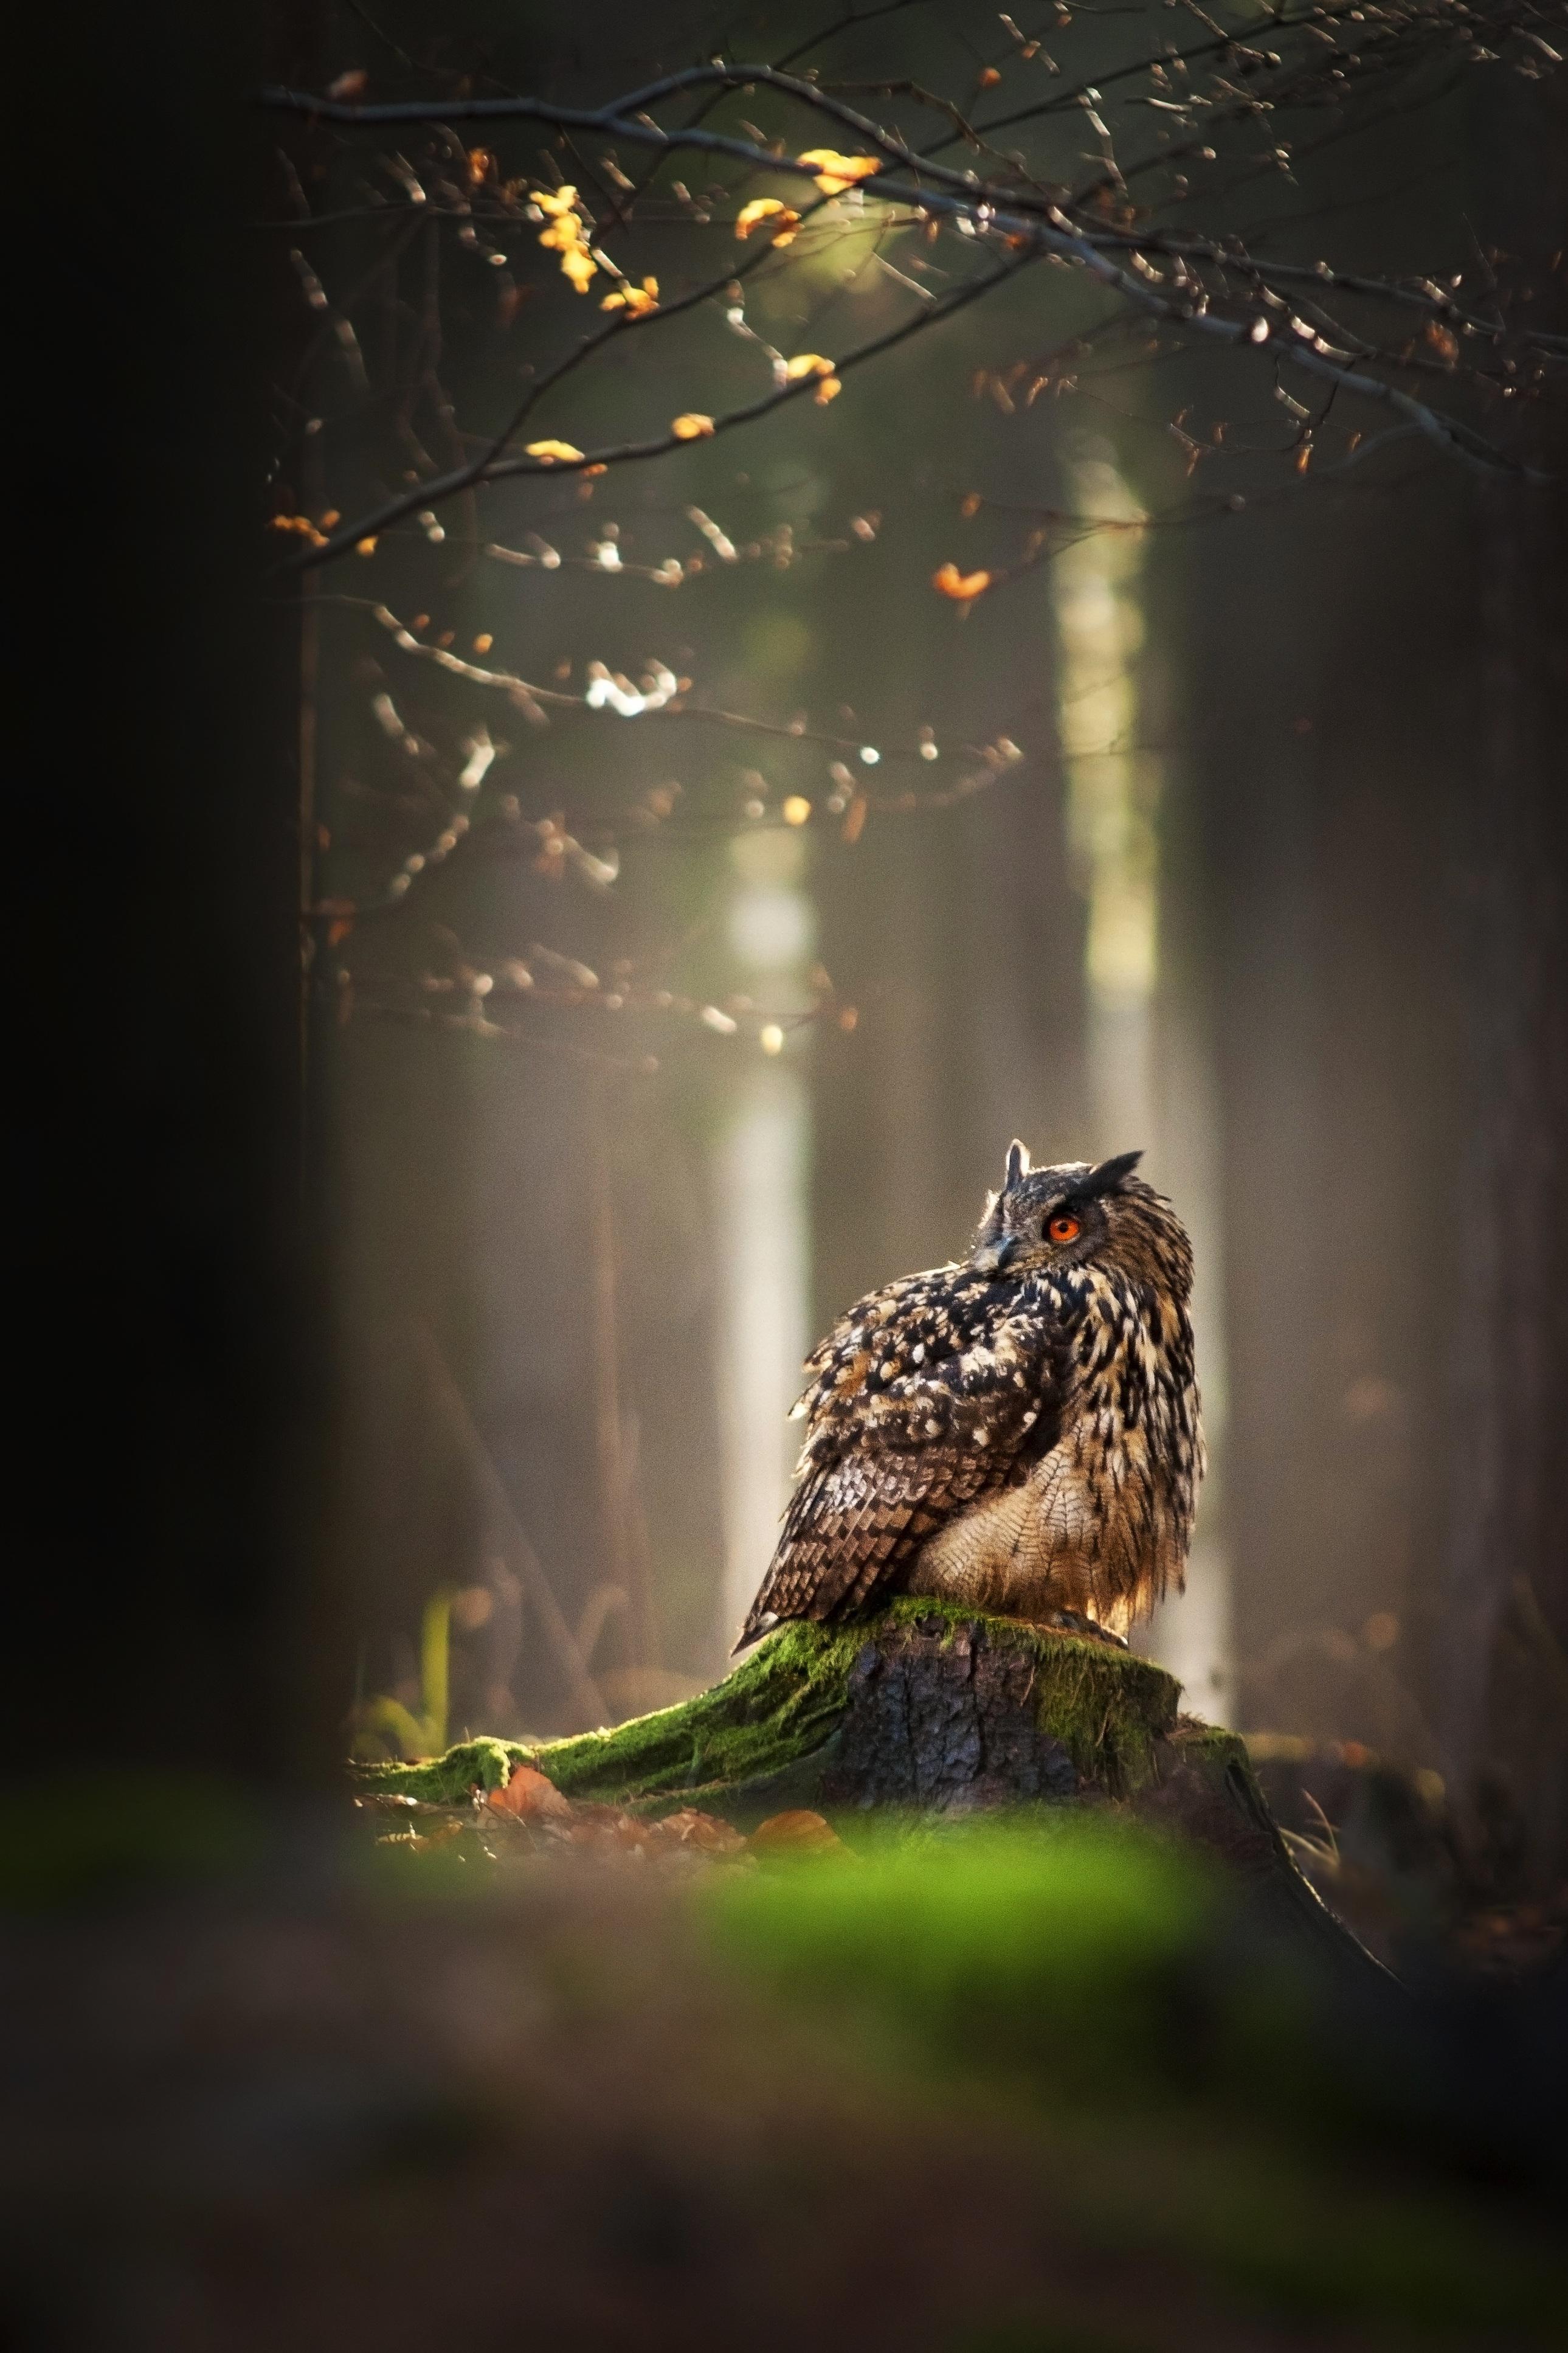 Free Images : tree, nature, branch, bird, light, night ... Darkness